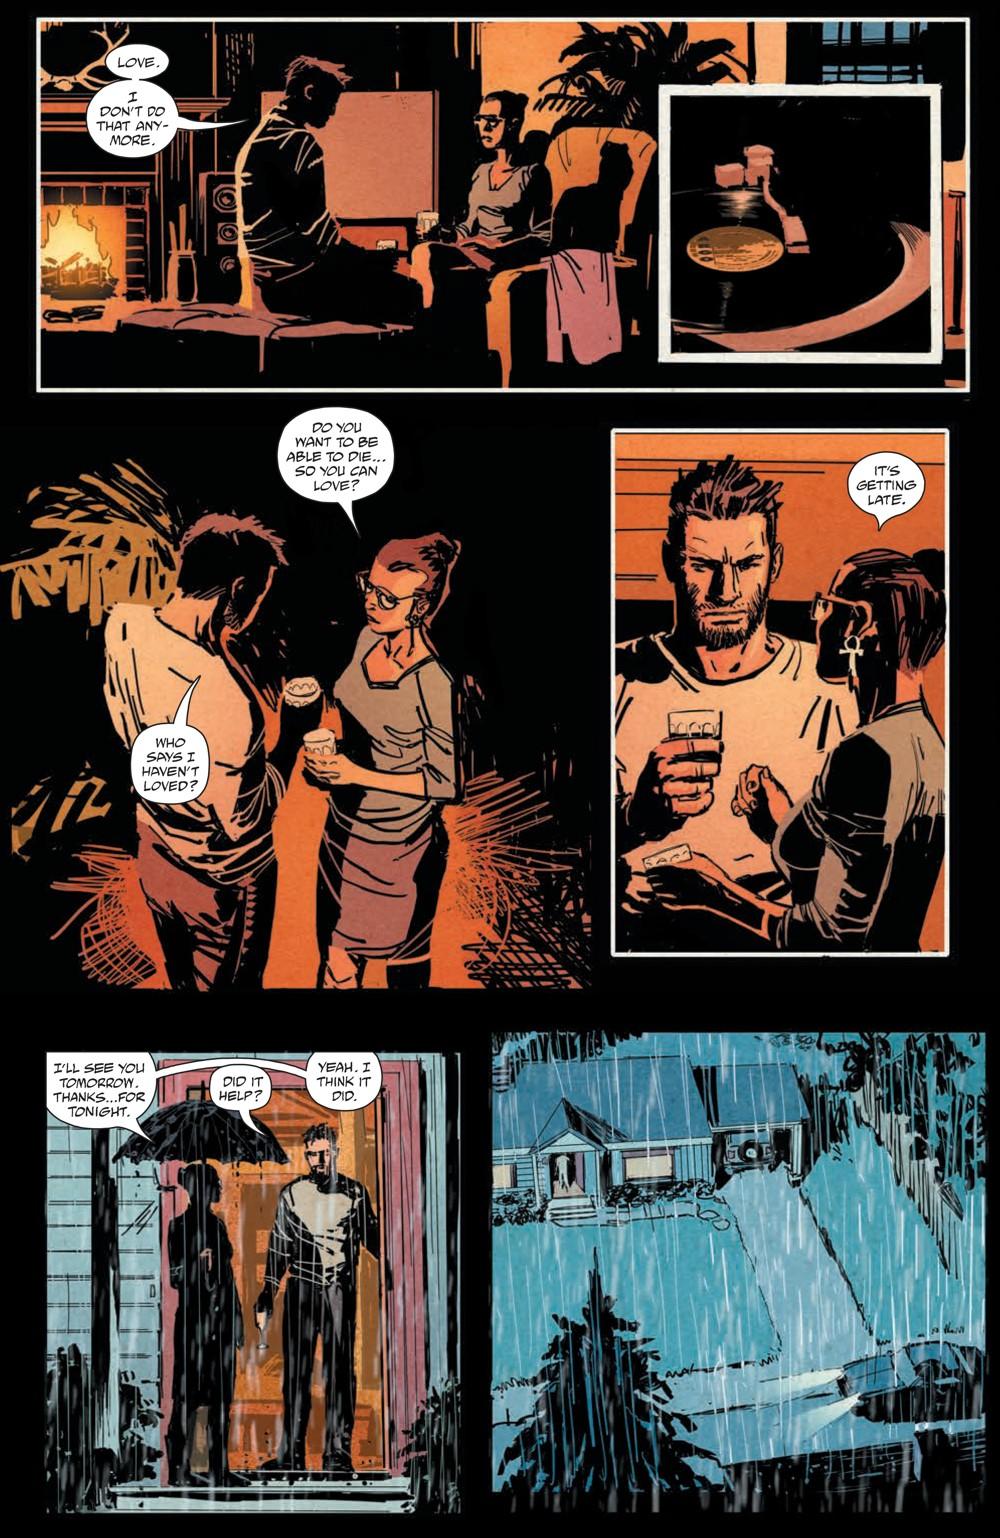 BRZRKR_005_PRESS_8 ComicList Previews: BRZRKR #5 (Of 12)